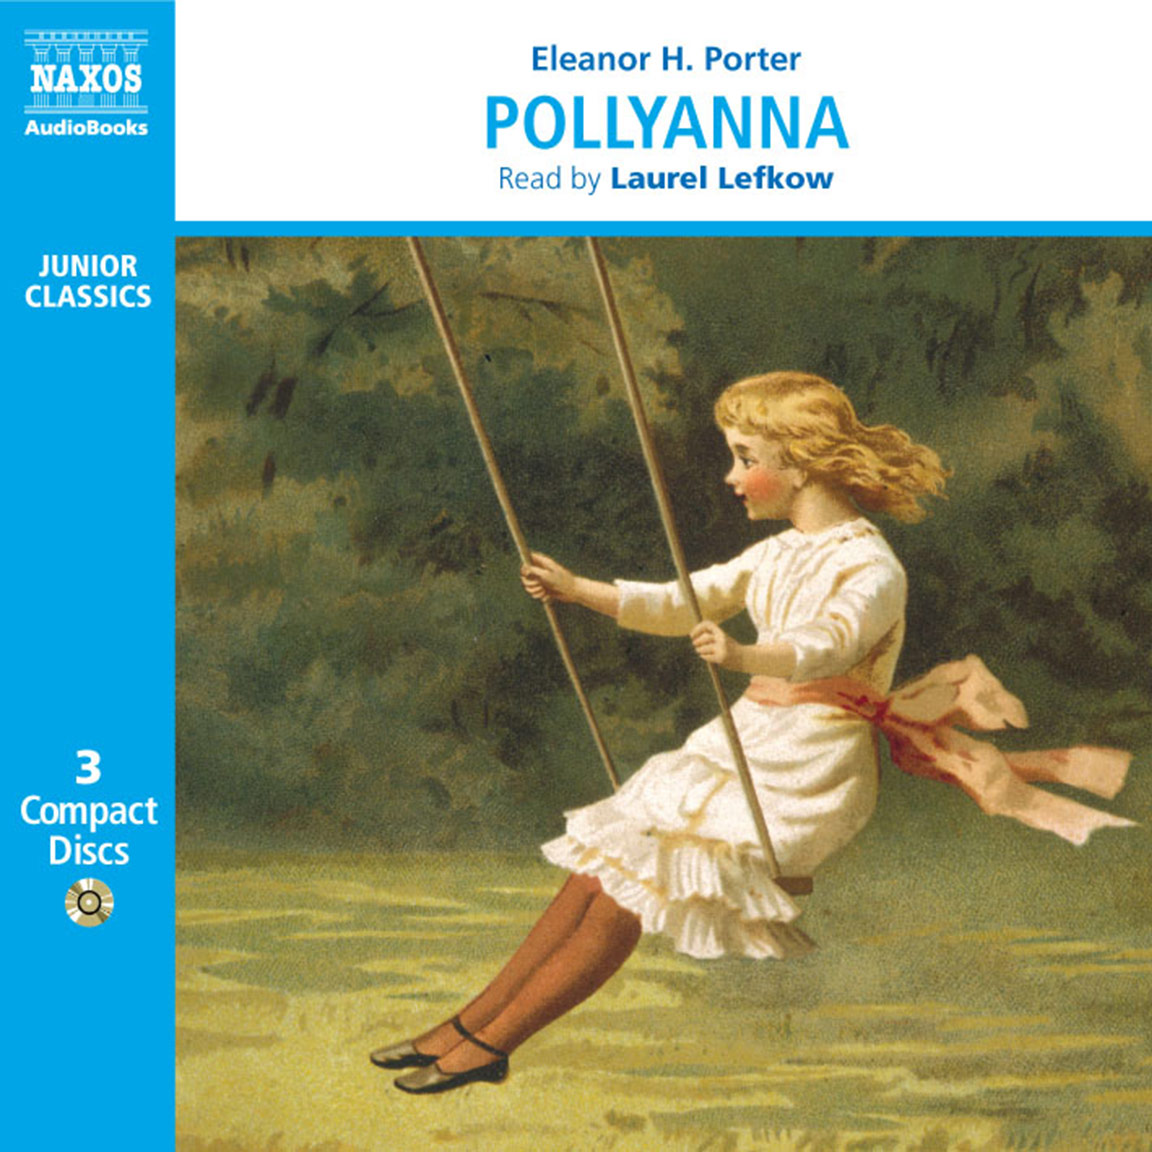 Pollyanna (abridged)